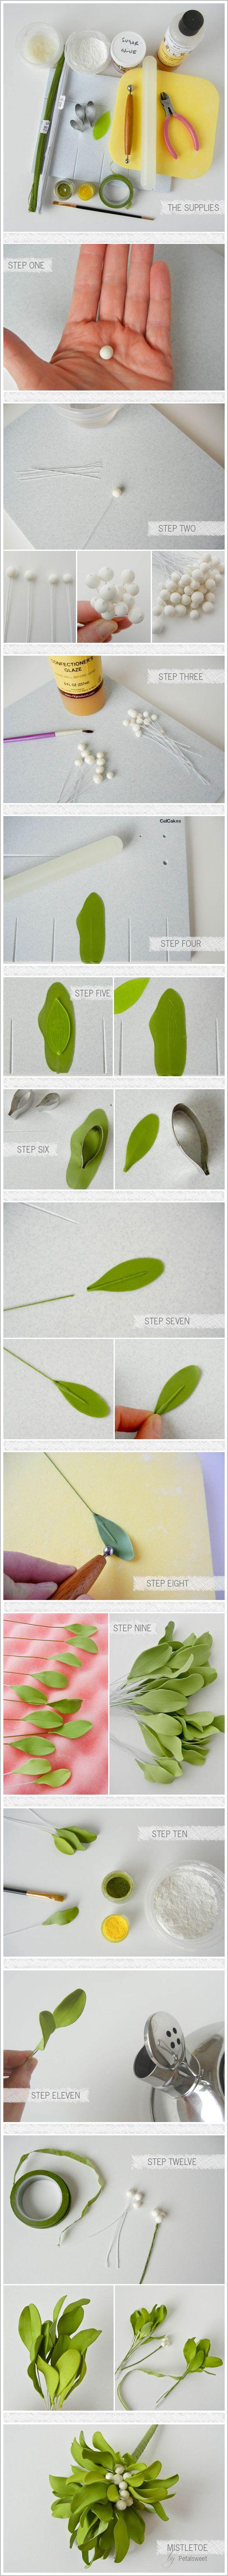 Sugar Mistletoe Tutorial by Petalsweet  |  TheCakeblog.com